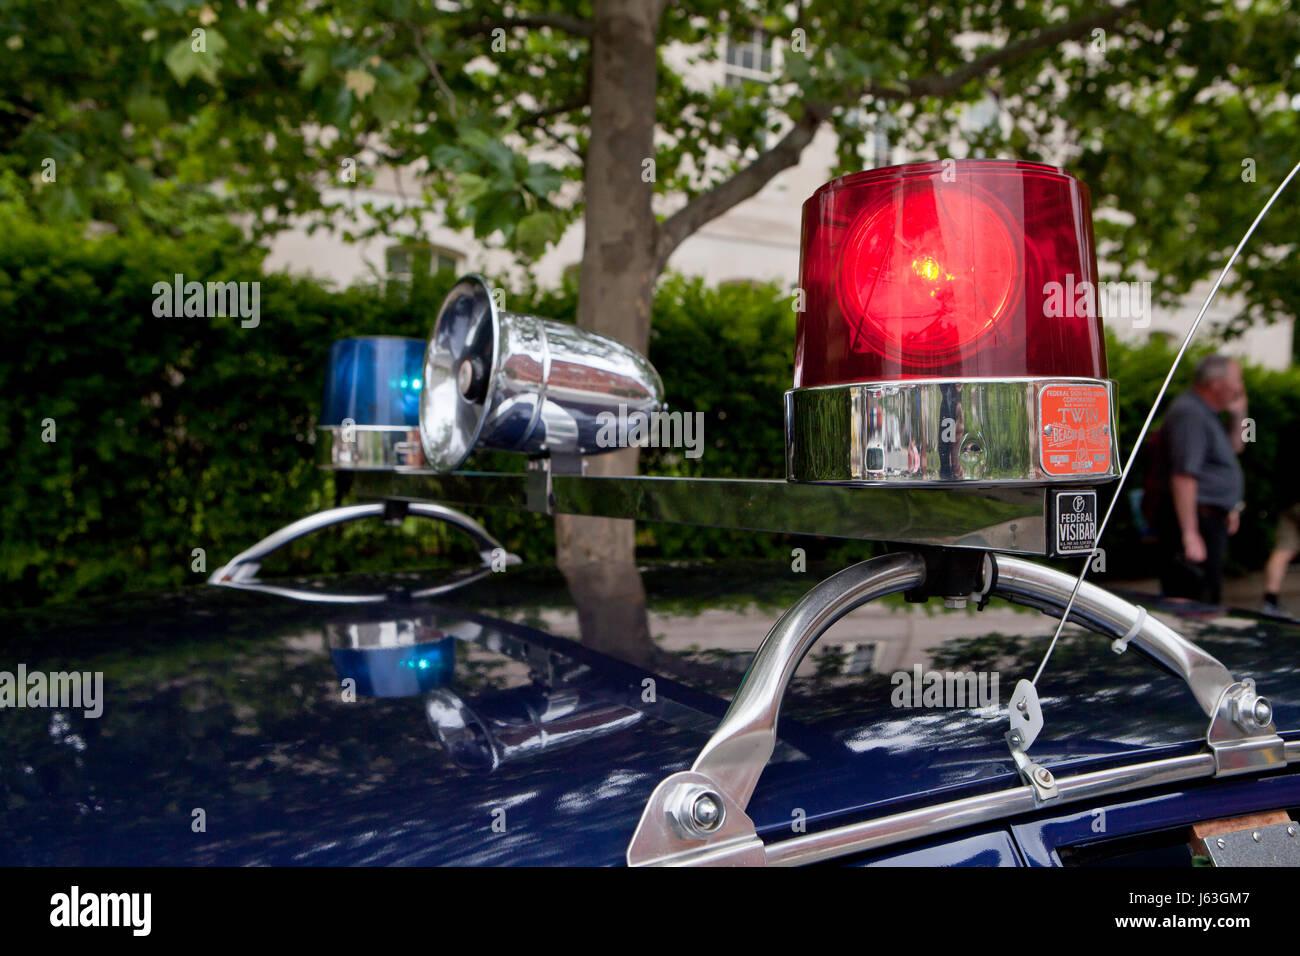 oldtimer auto blaulicht und sirene usa stockfoto bild 141449847 alamy. Black Bedroom Furniture Sets. Home Design Ideas